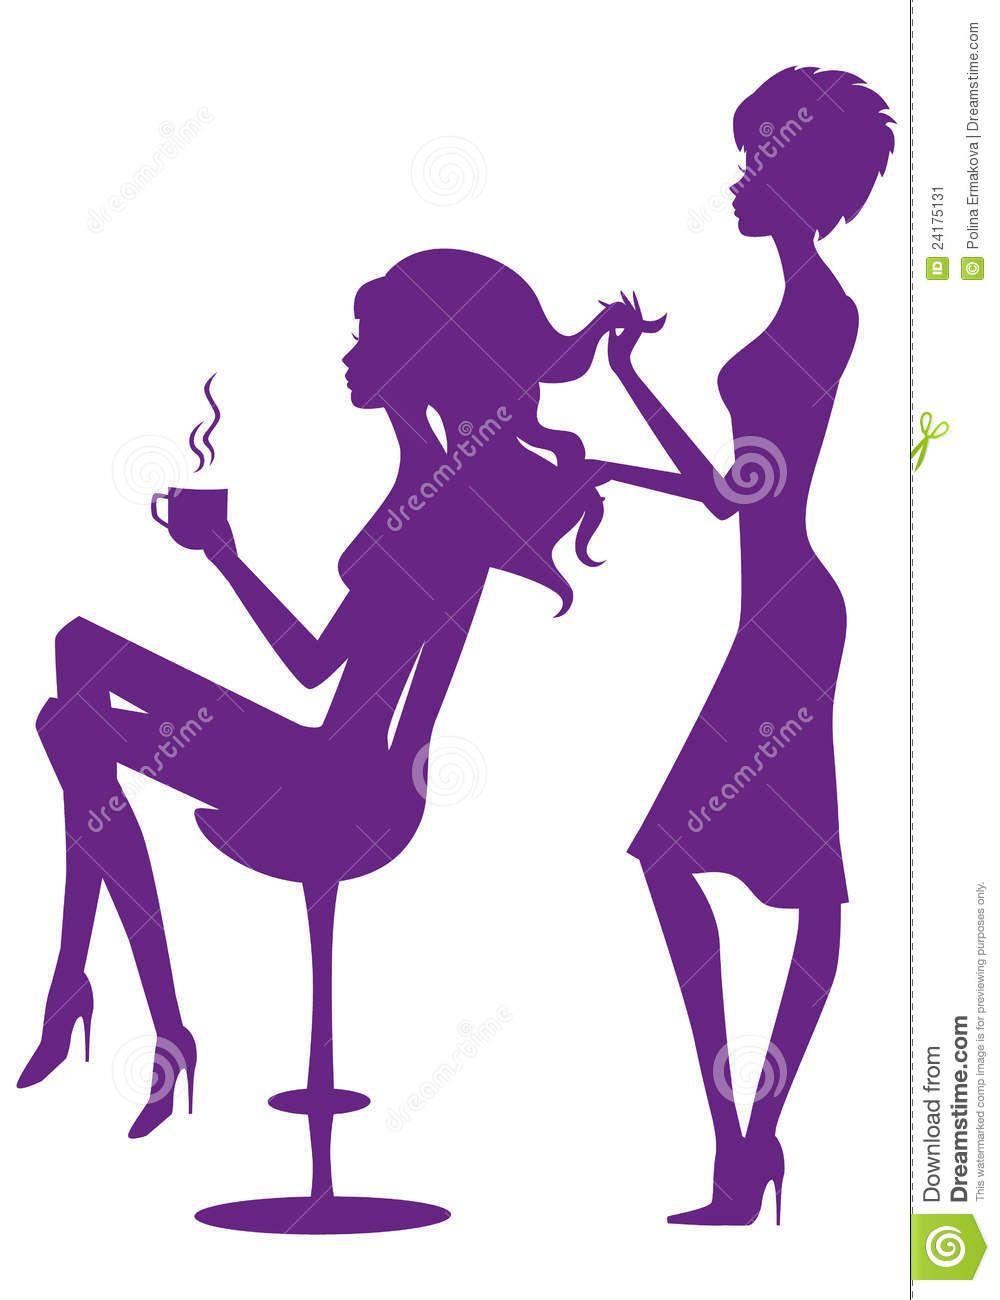 hair beauty salon clip art 725392 jpg 1000 1300 my salon rh pinterest com Cosmetologist Clip Art free hair stylist clipart